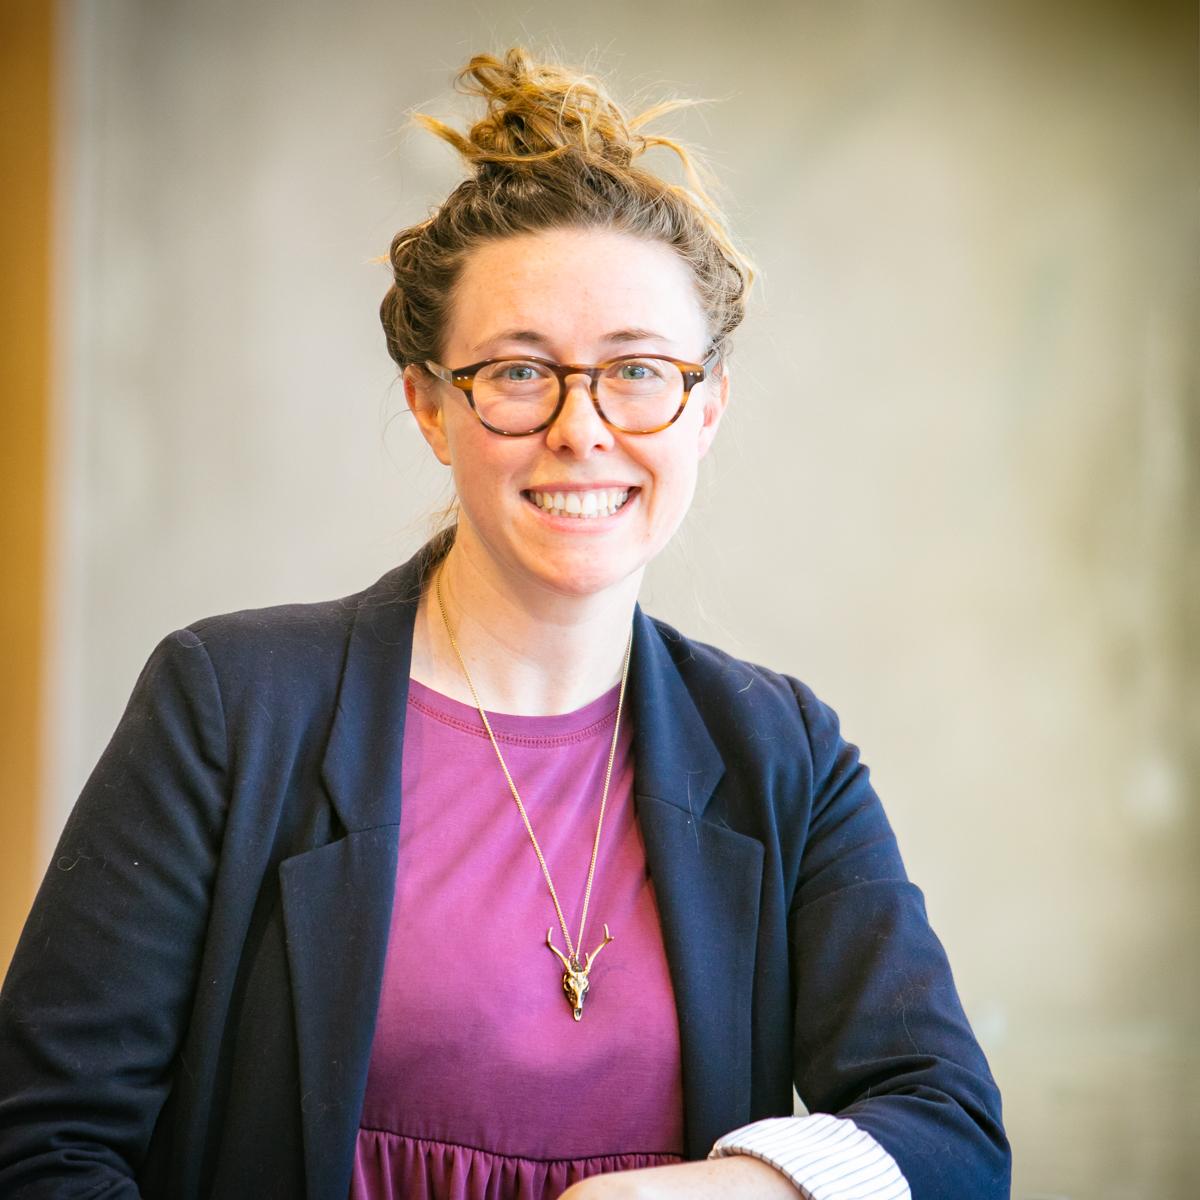 Portrait of graduate student Samantha Allen